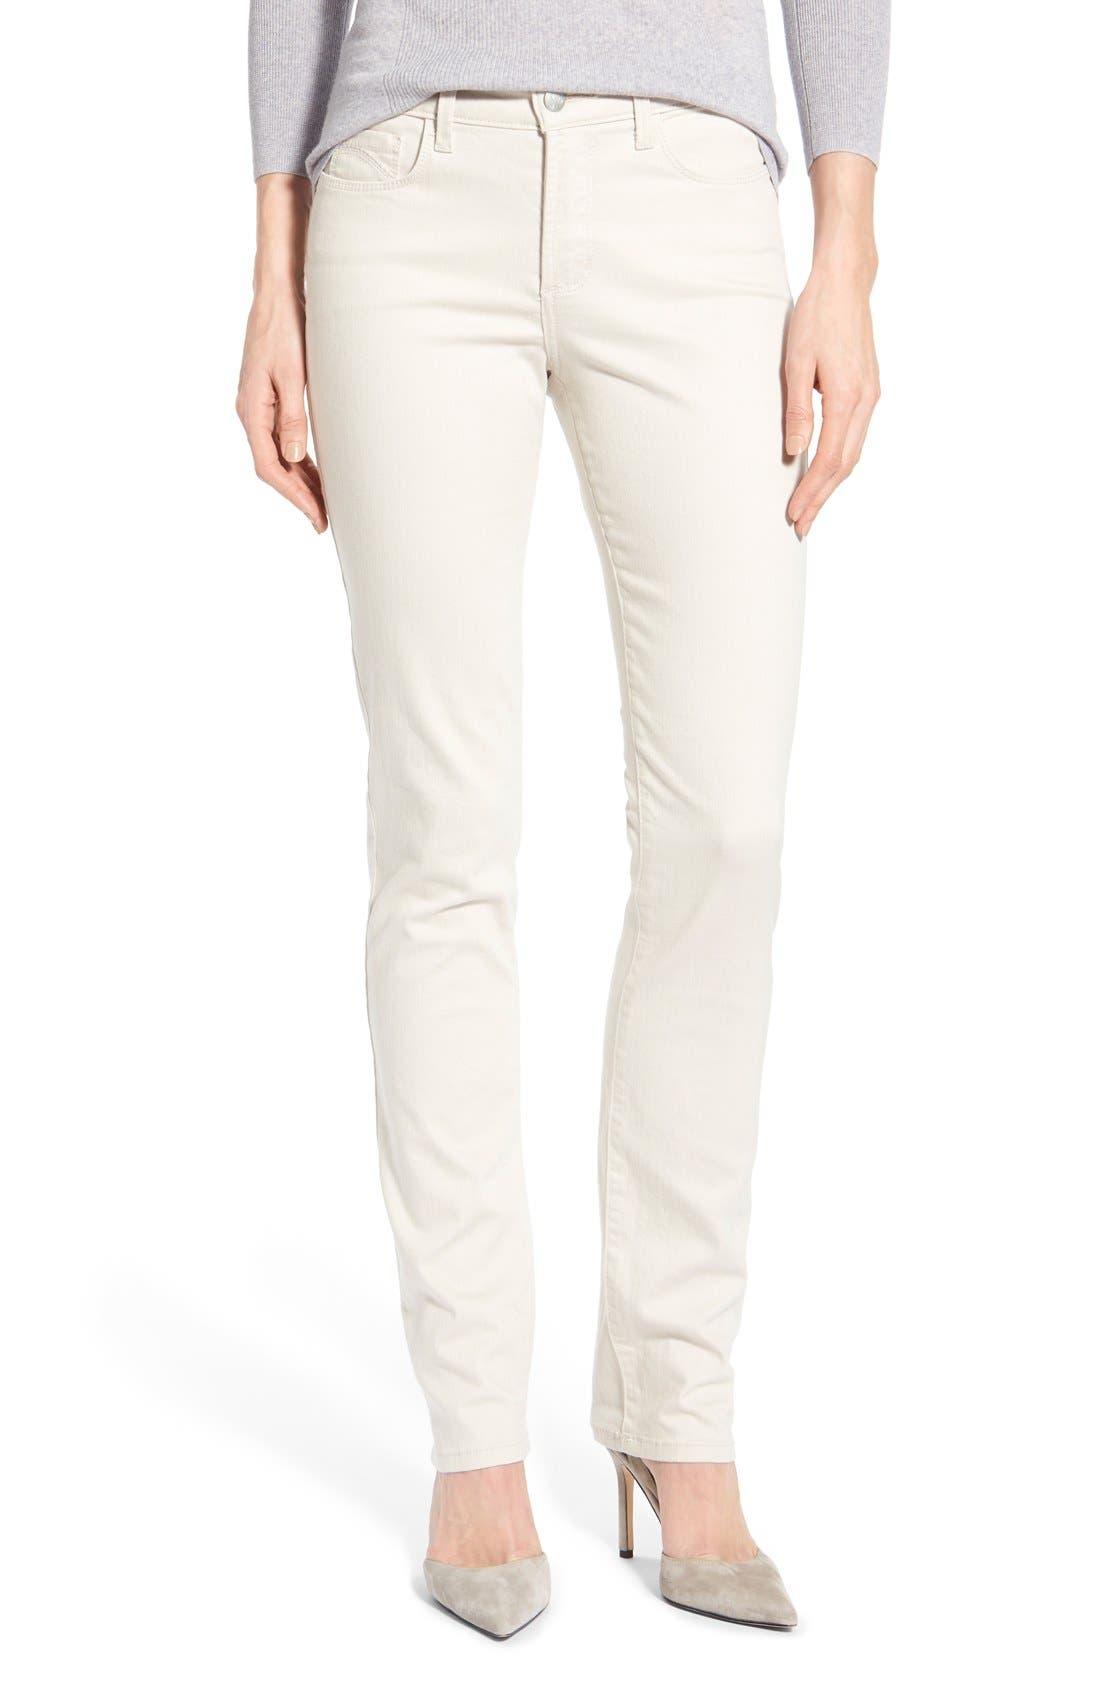 'Samantha' Stretch Slim Straight Leg Jeans,                         Main,                         color, Clay